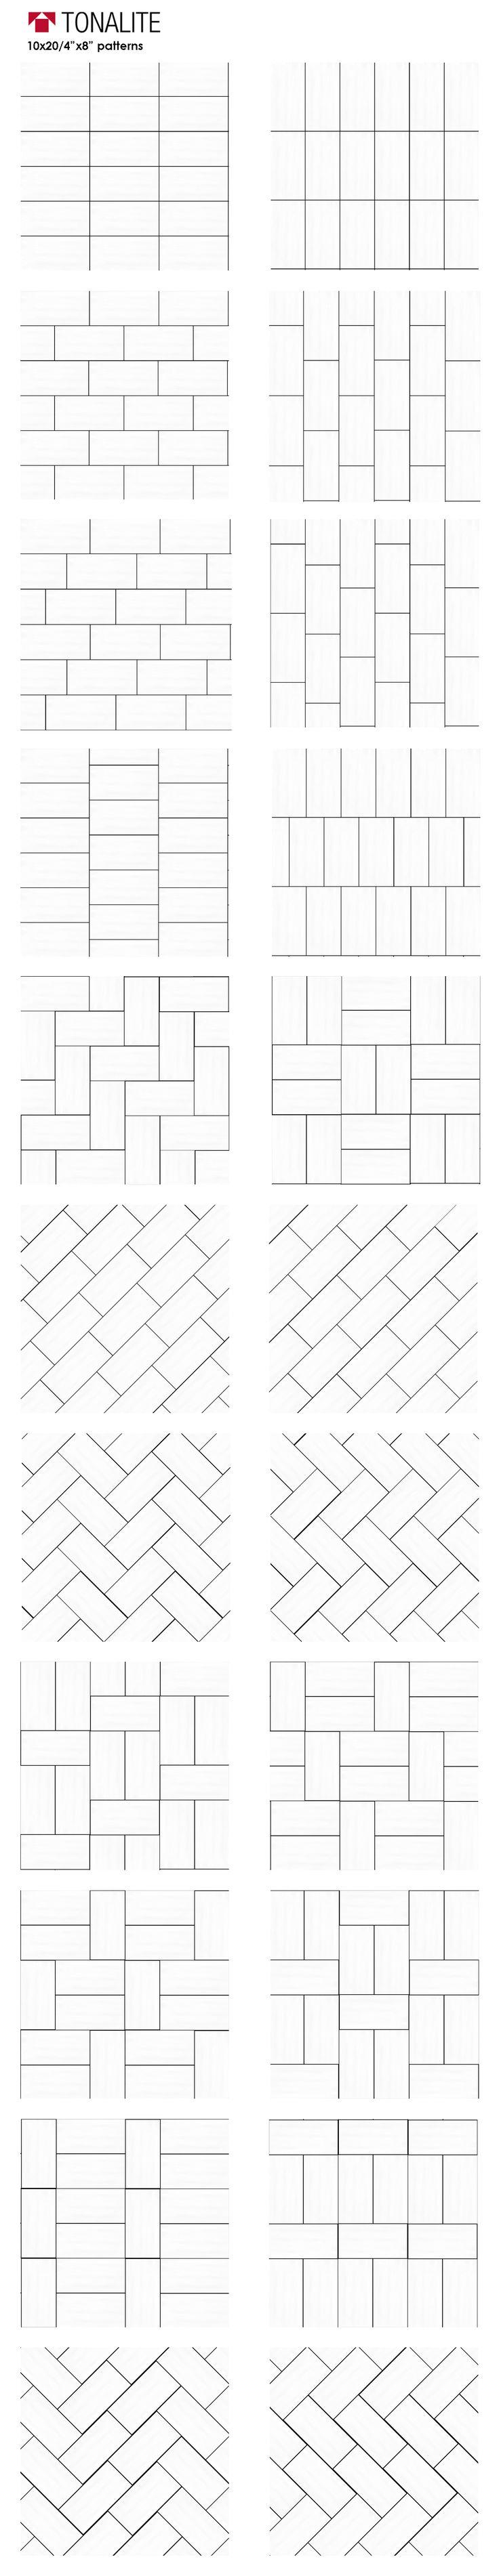 Tonalite 20 creative ways to lay 4″x8″ tile. subwa…